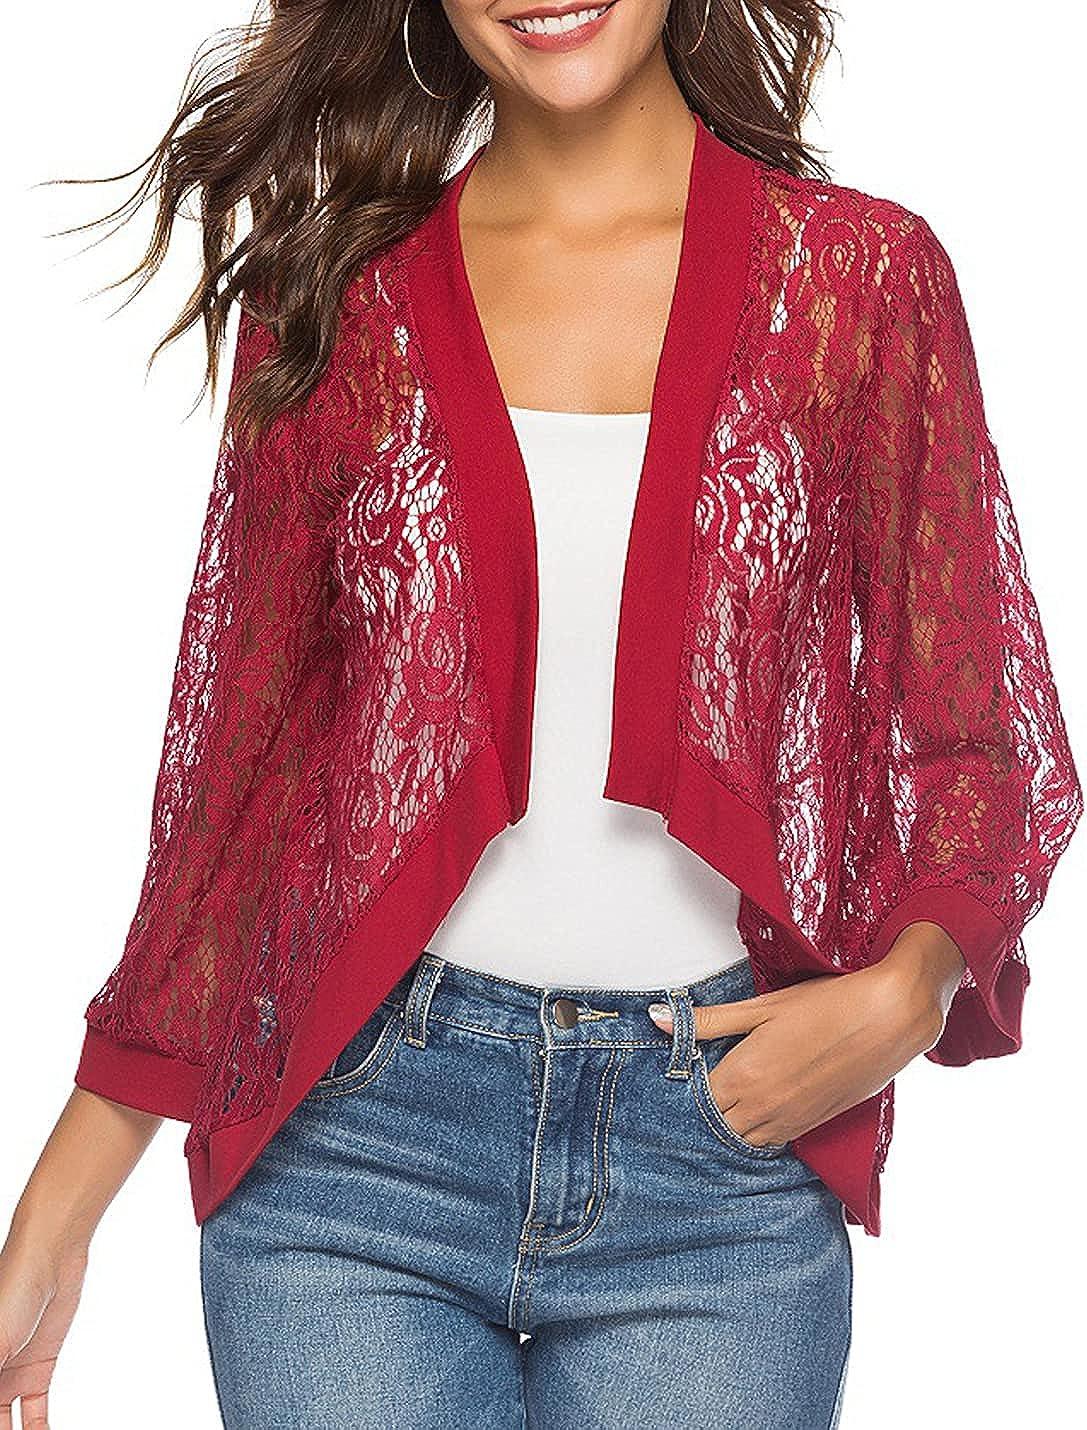 PEHMEA Women's 3/4 Sleeve Floral Lace Shrug Open Front Bolero Cardigan Crop Jacket (Red, X-Large)